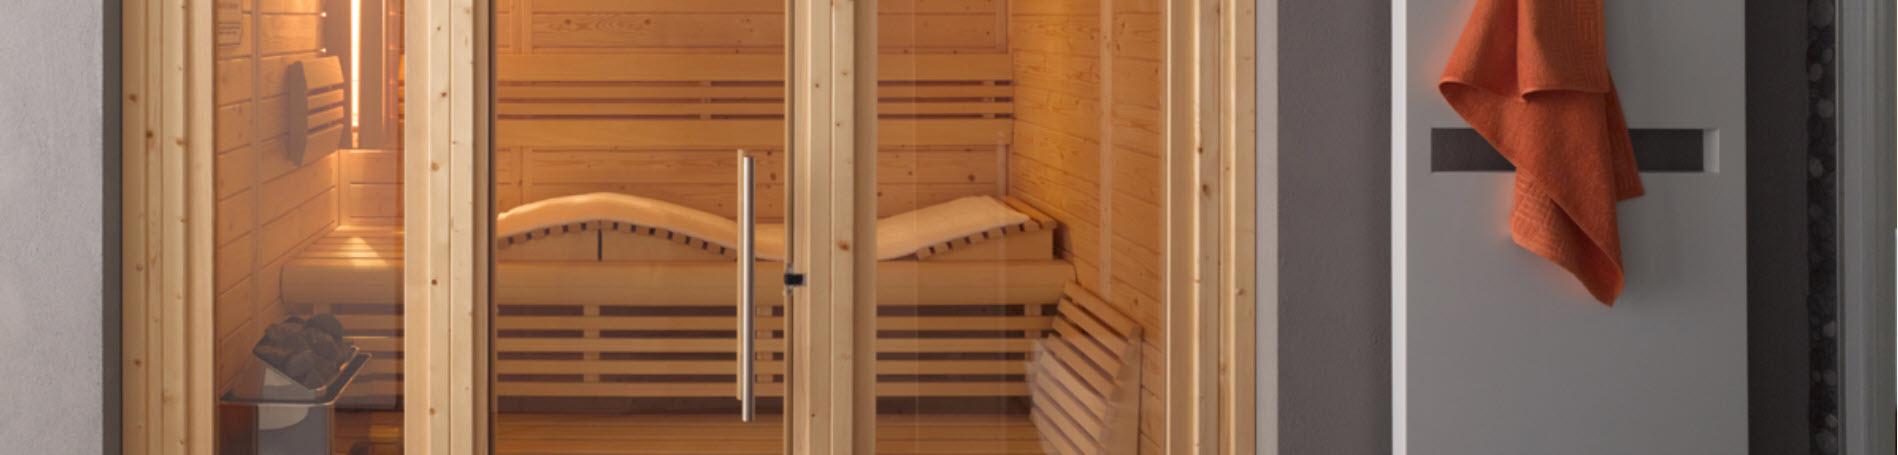 Sauna Soaking Can Provide Quick Pain Relief, Infrared Saunas Dealer Burnsville